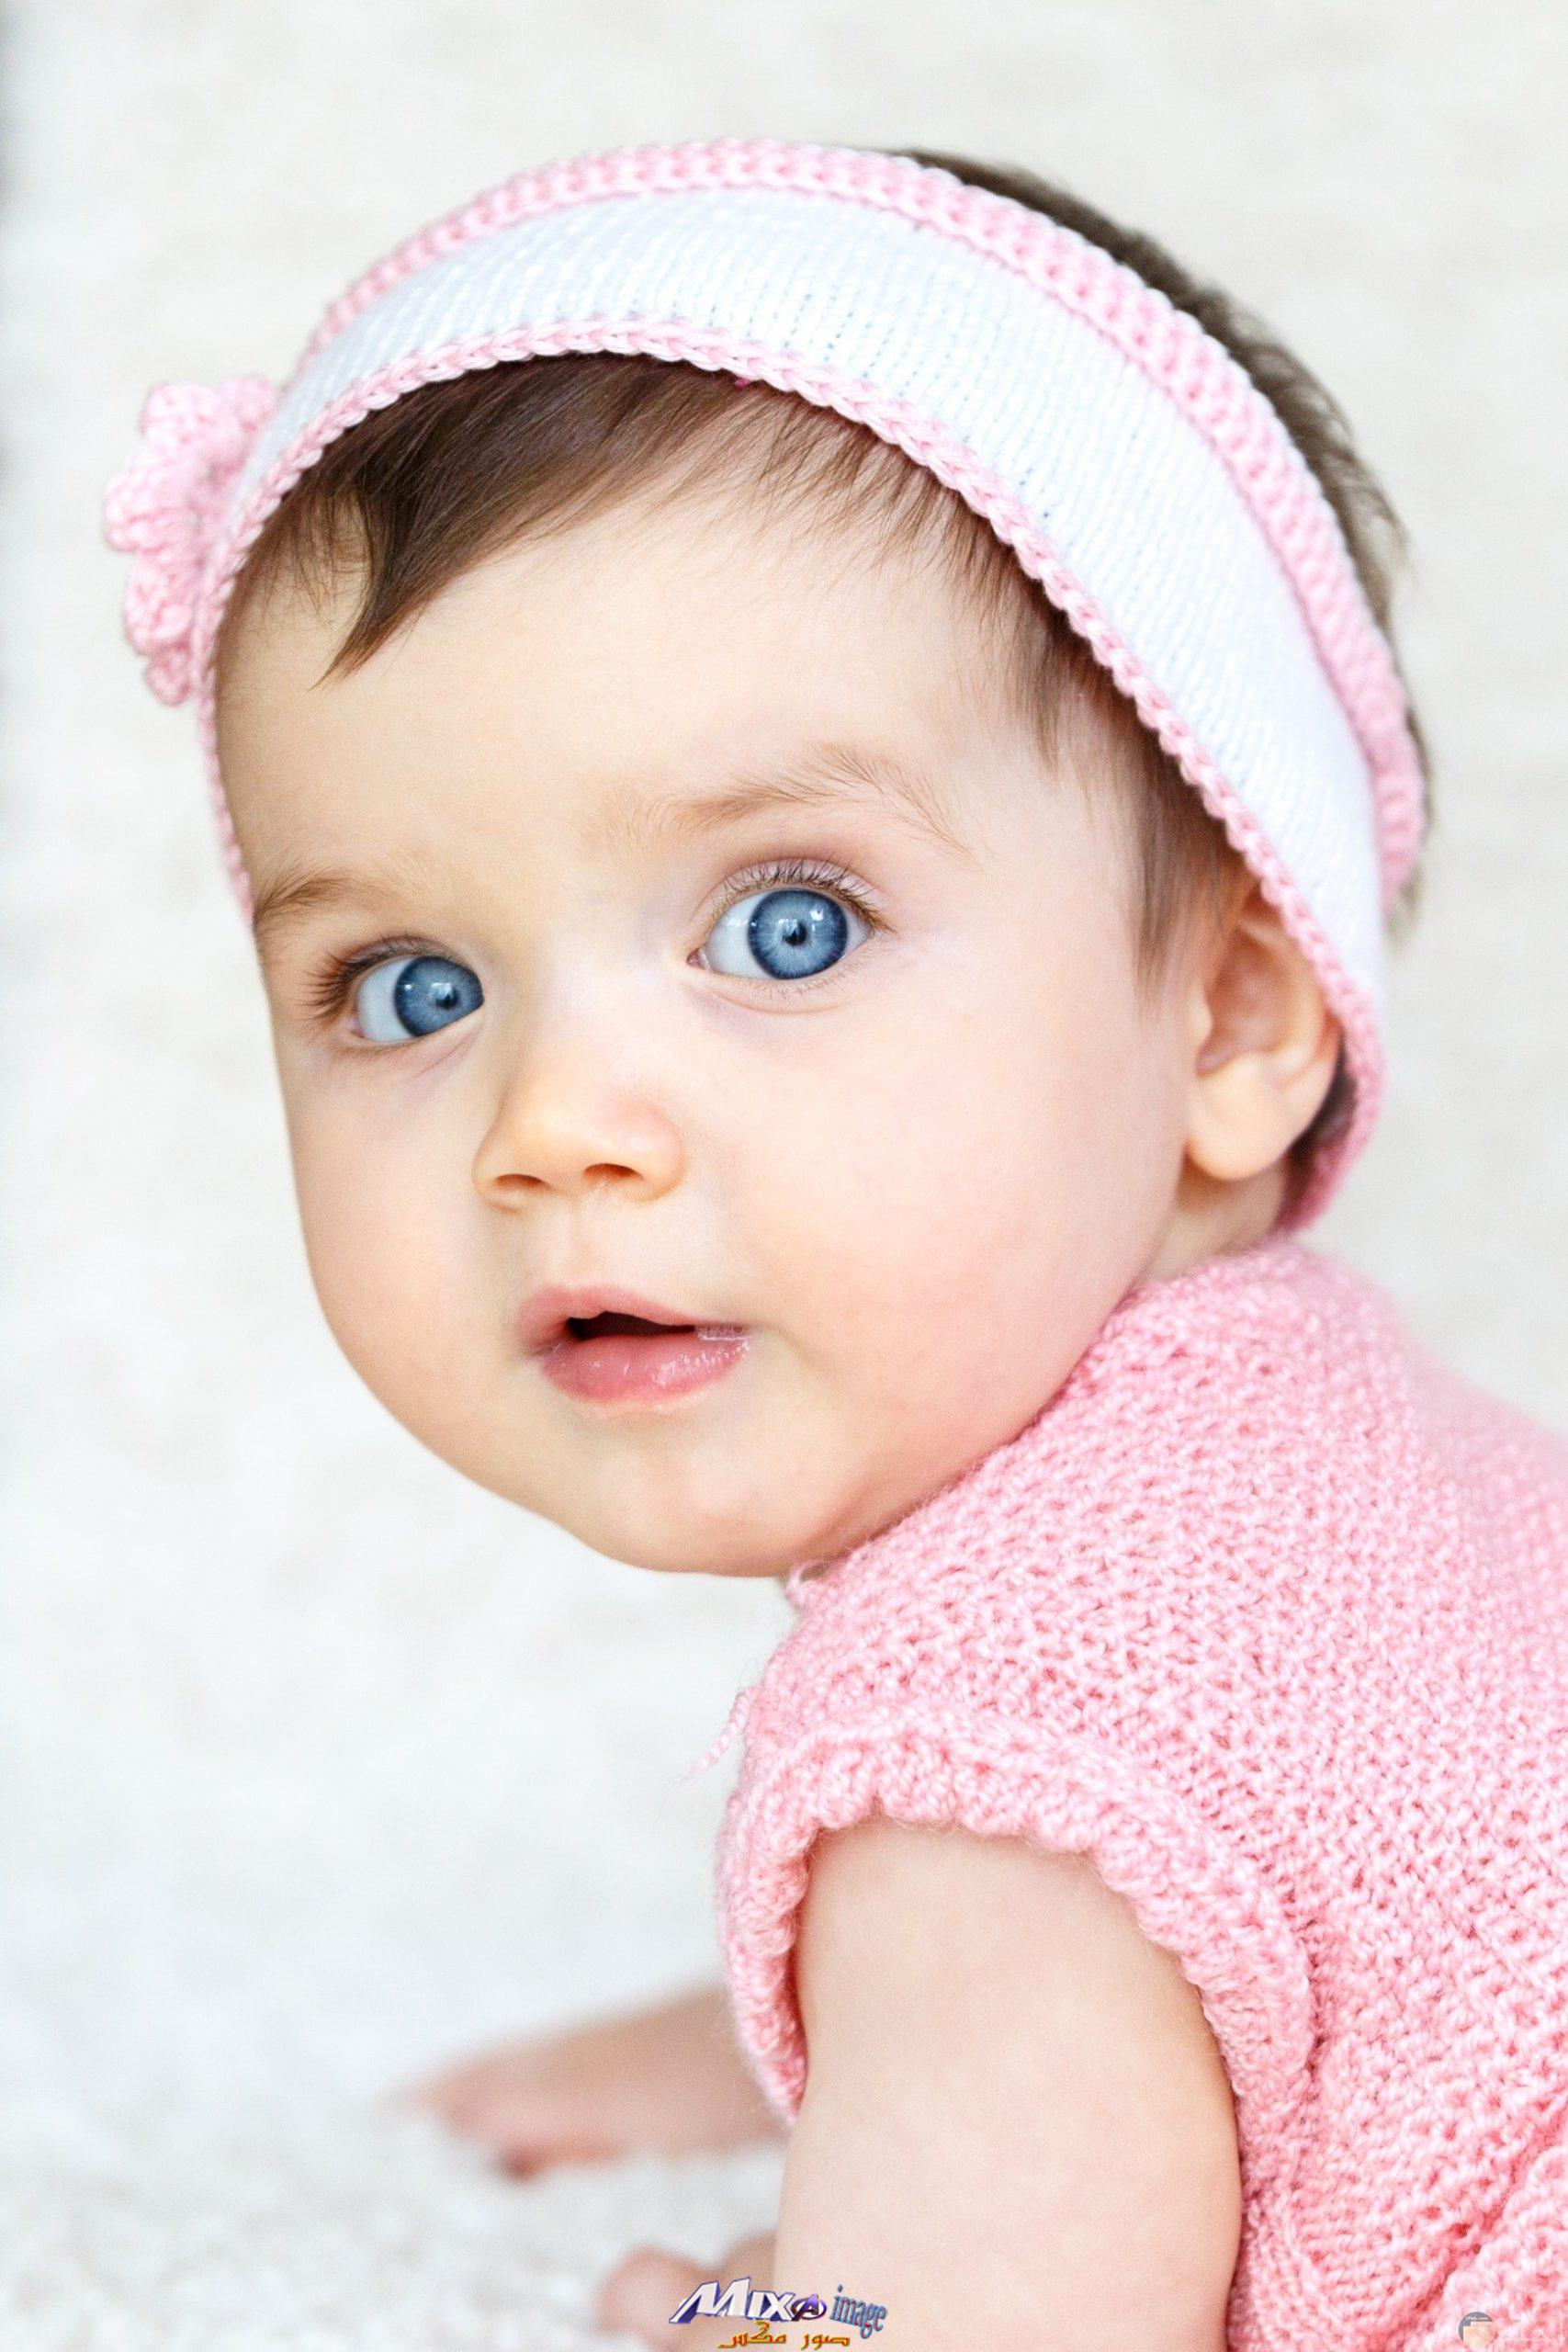 صور اطفال صور بيبي صور اولاد صور حلوين اطفال حلوينصور اطفال صغار2020 45